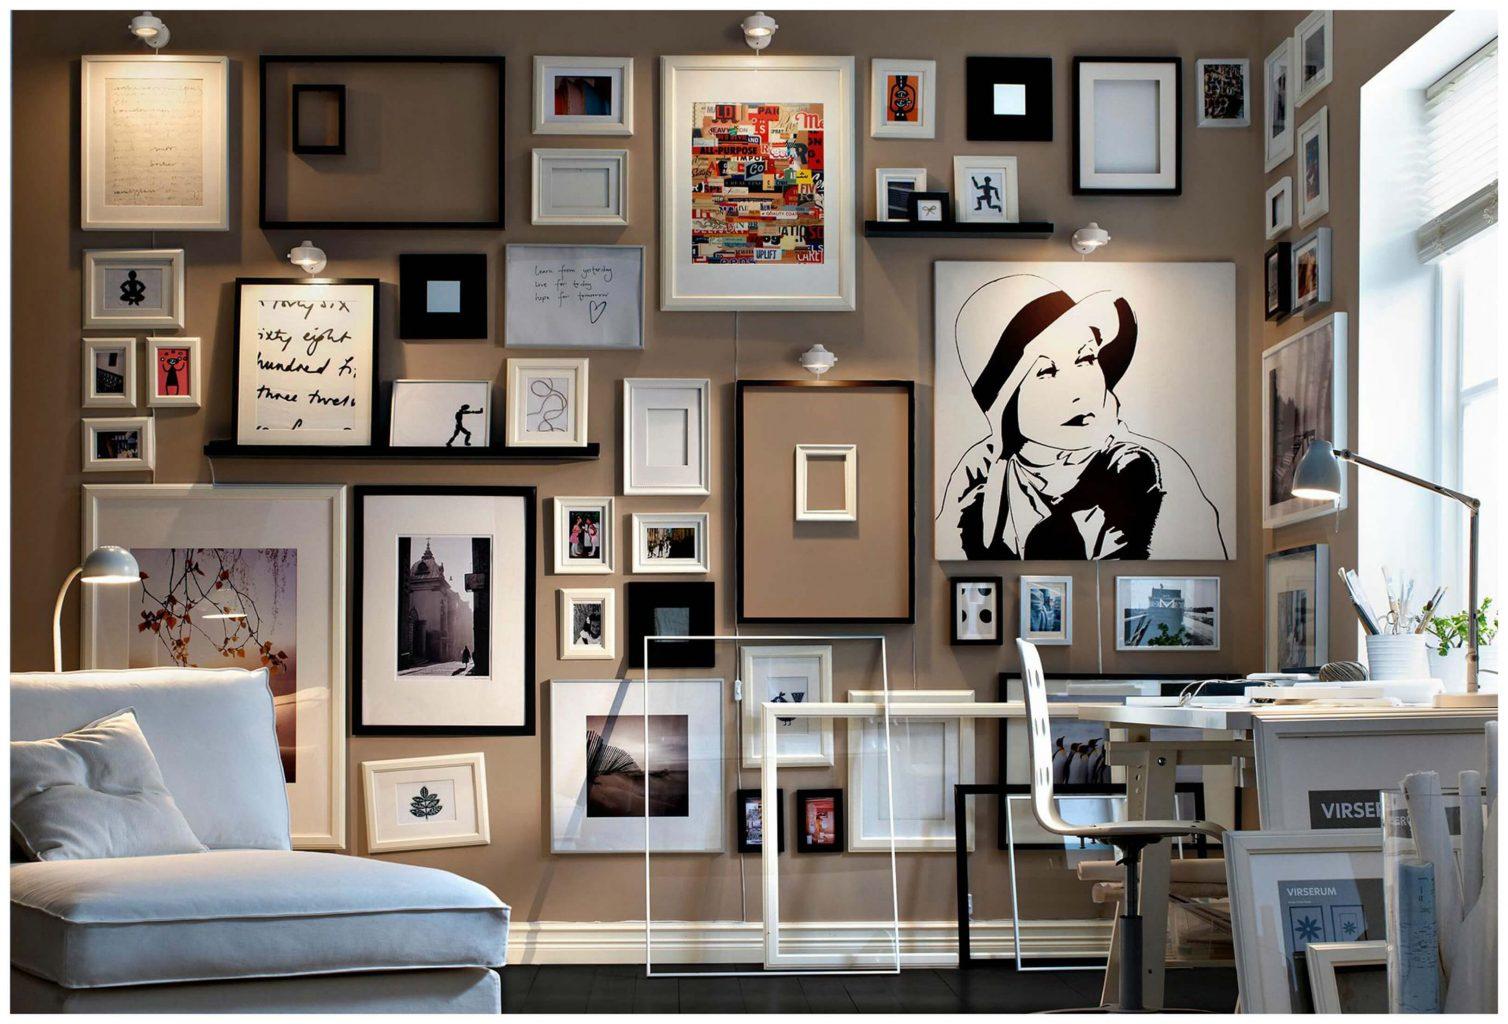 quadri-in-stile-moderno